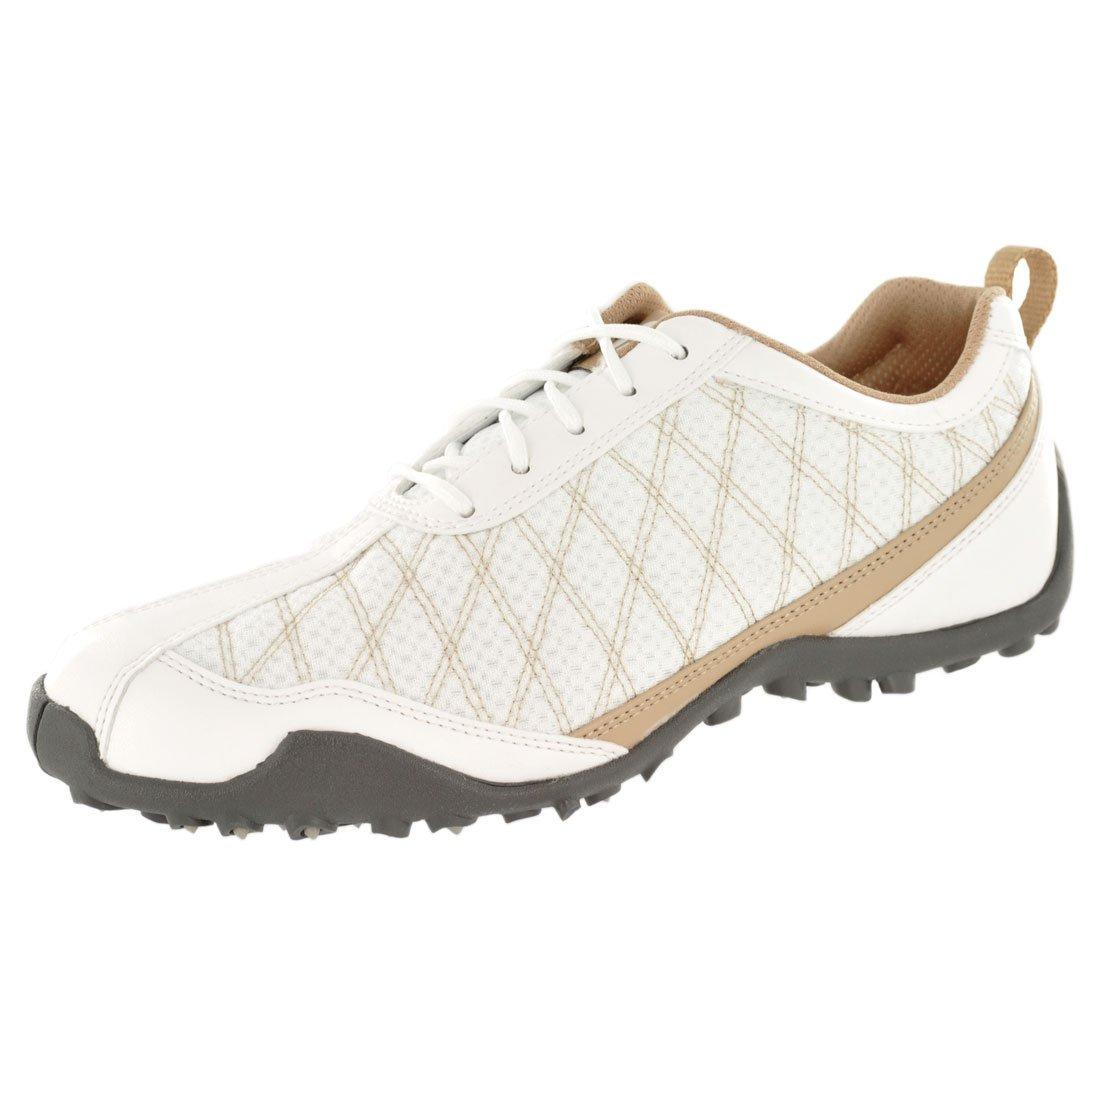 FootJoy Ladies Summer Series Golf Shoes 98847 White/Tan Womens Closeout New B00LU9J6SC 7 (M)